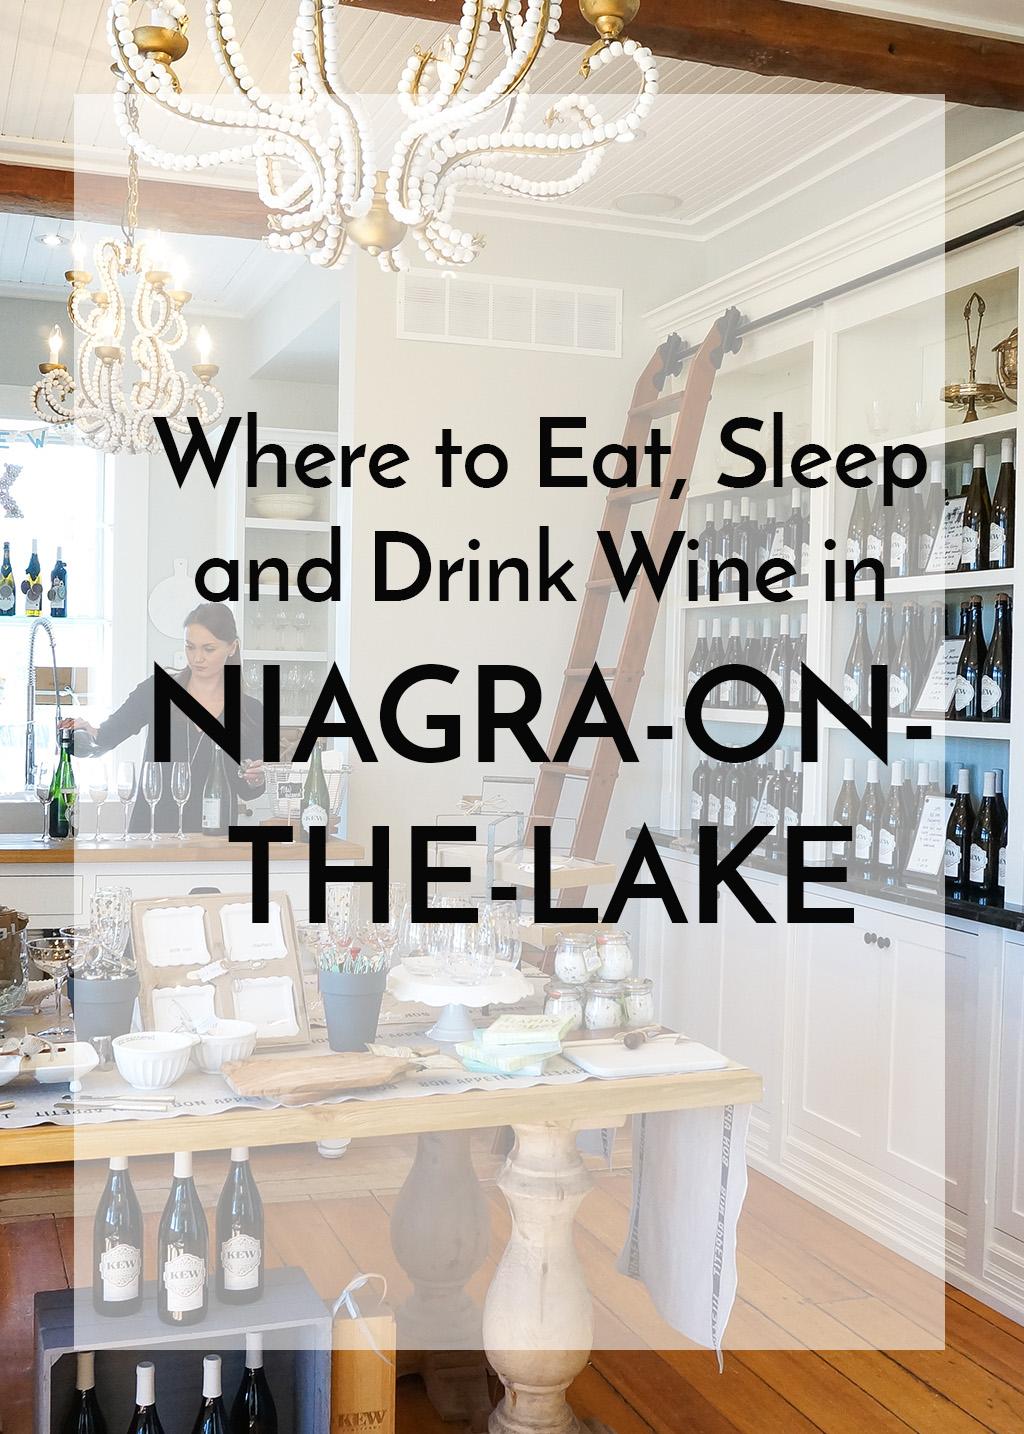 Where to Eat, Sleep and Drink Wine in Niagara-on-the-Lake